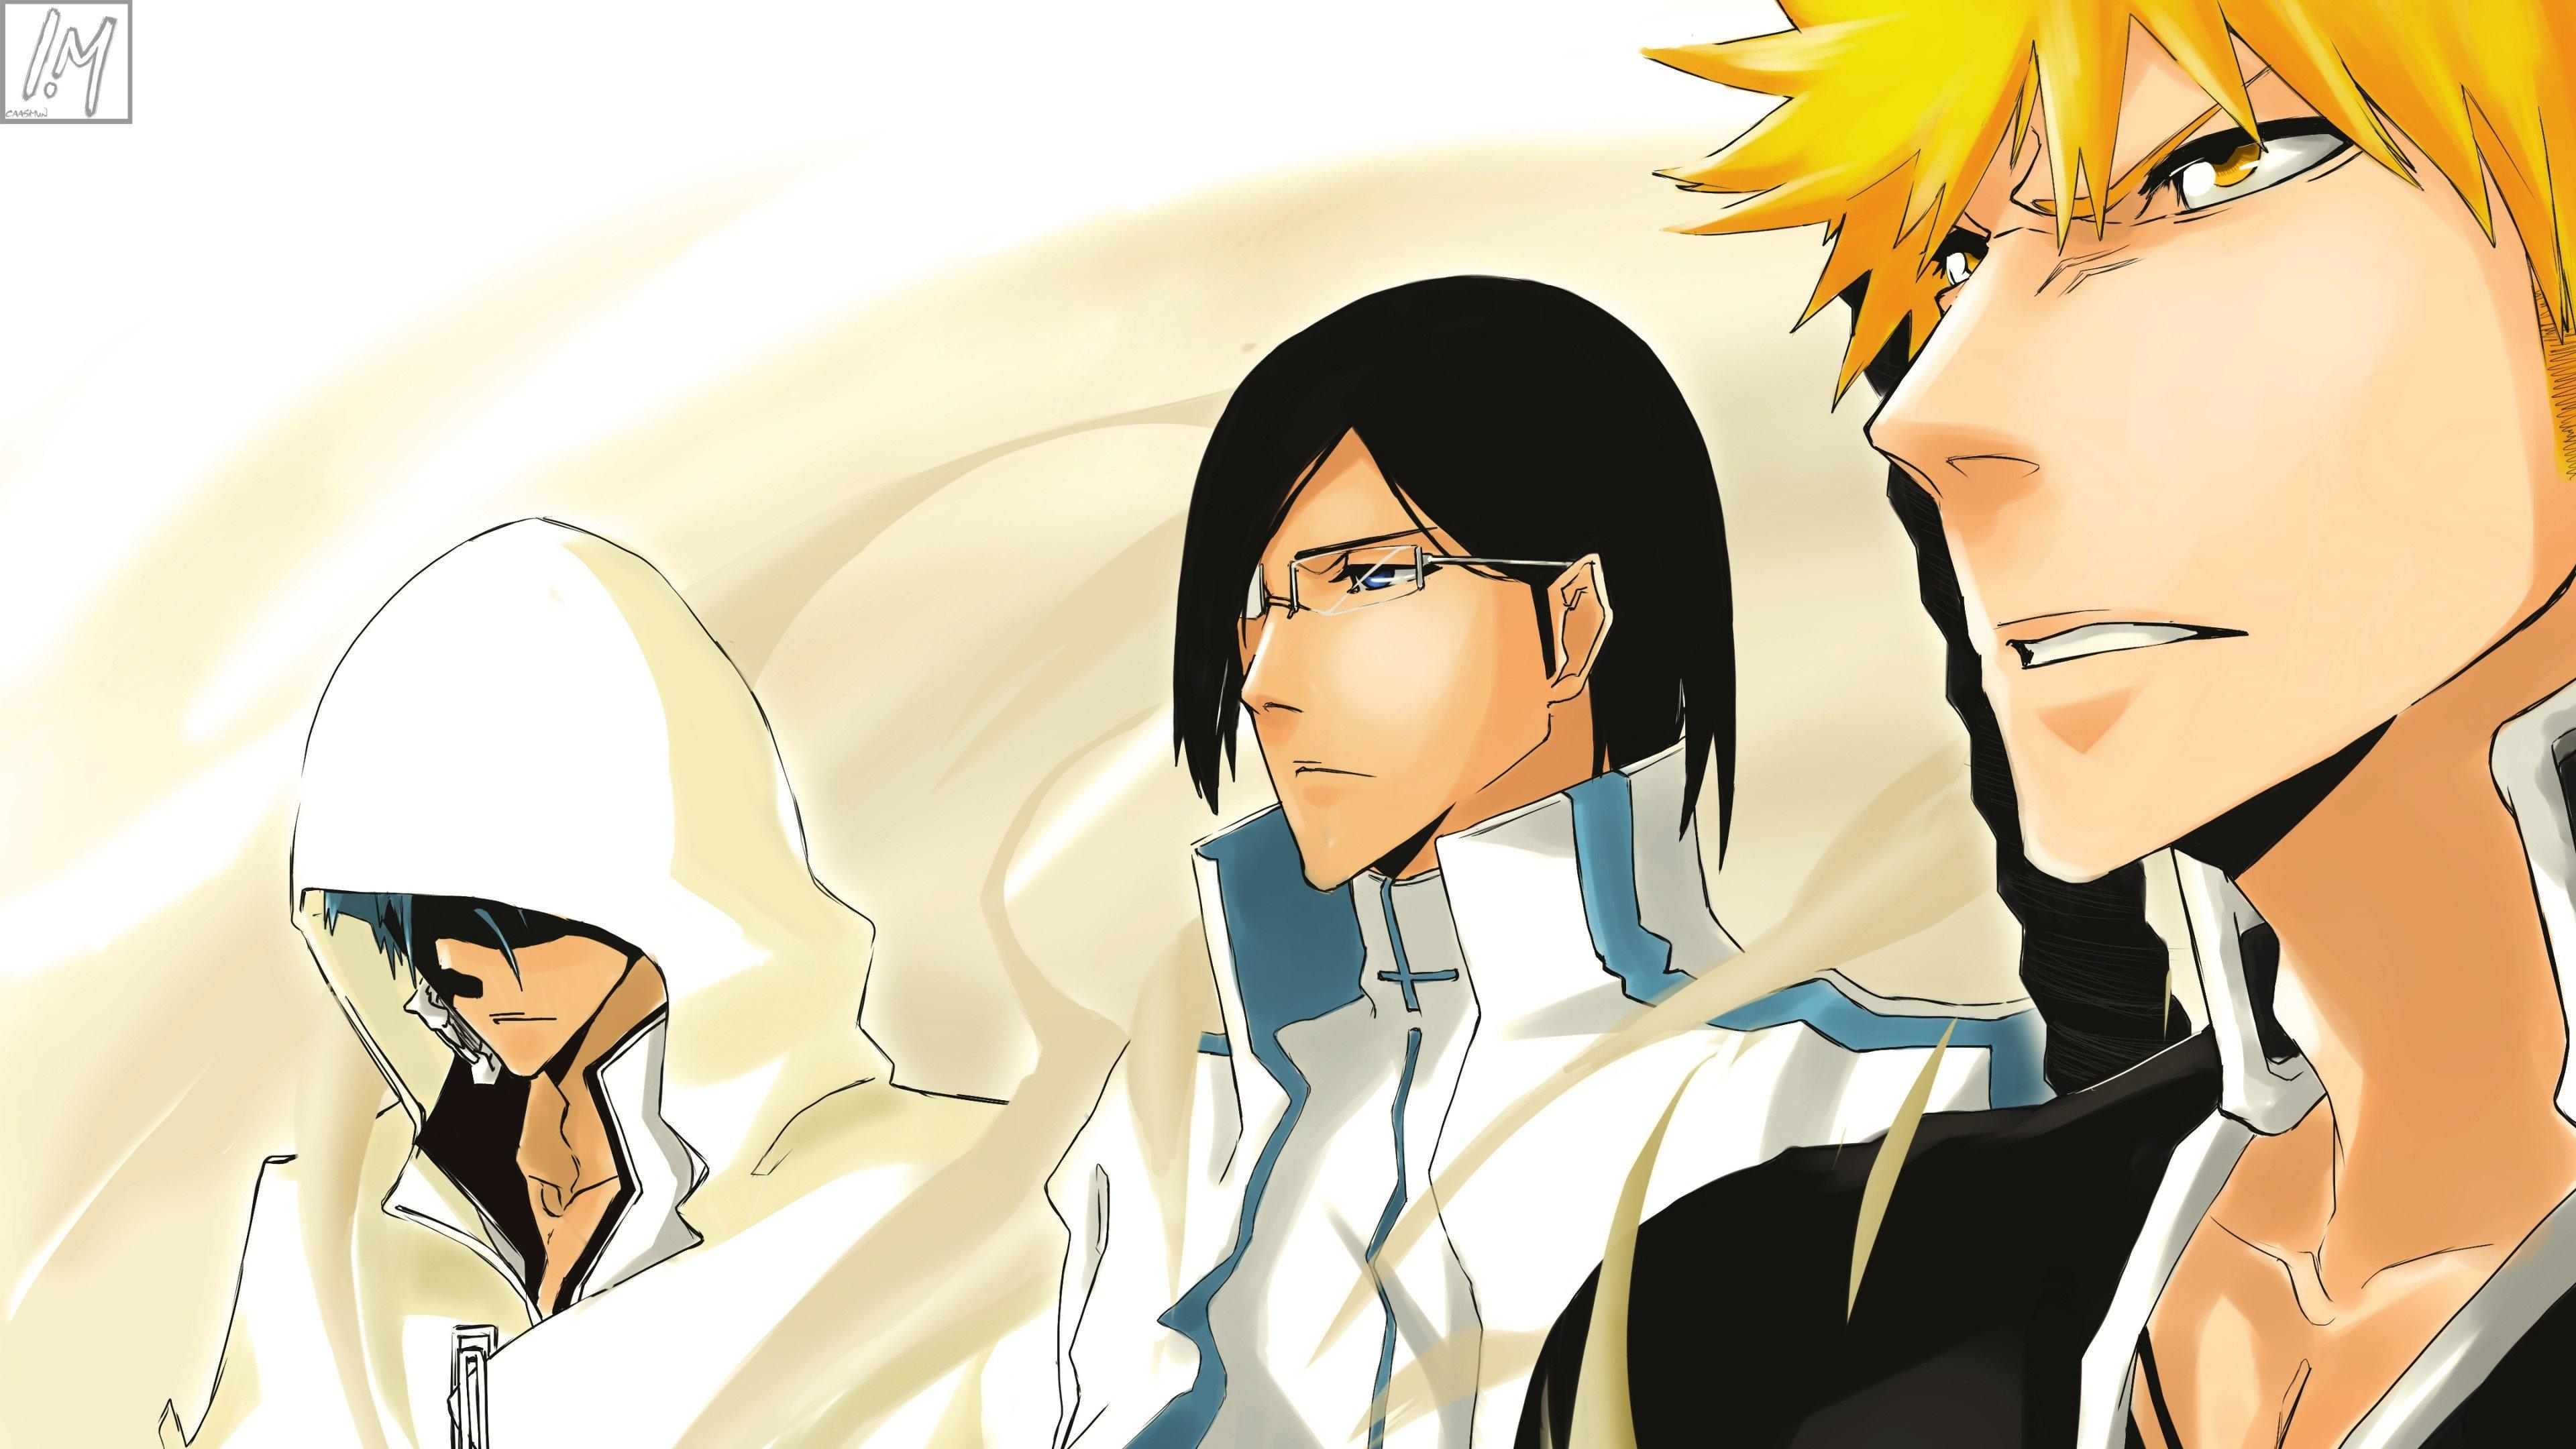 Fondos de pantalla Anime Bleach Ichigo, Kurosaki Shinigami y Grimmjow Jaegerjaquez